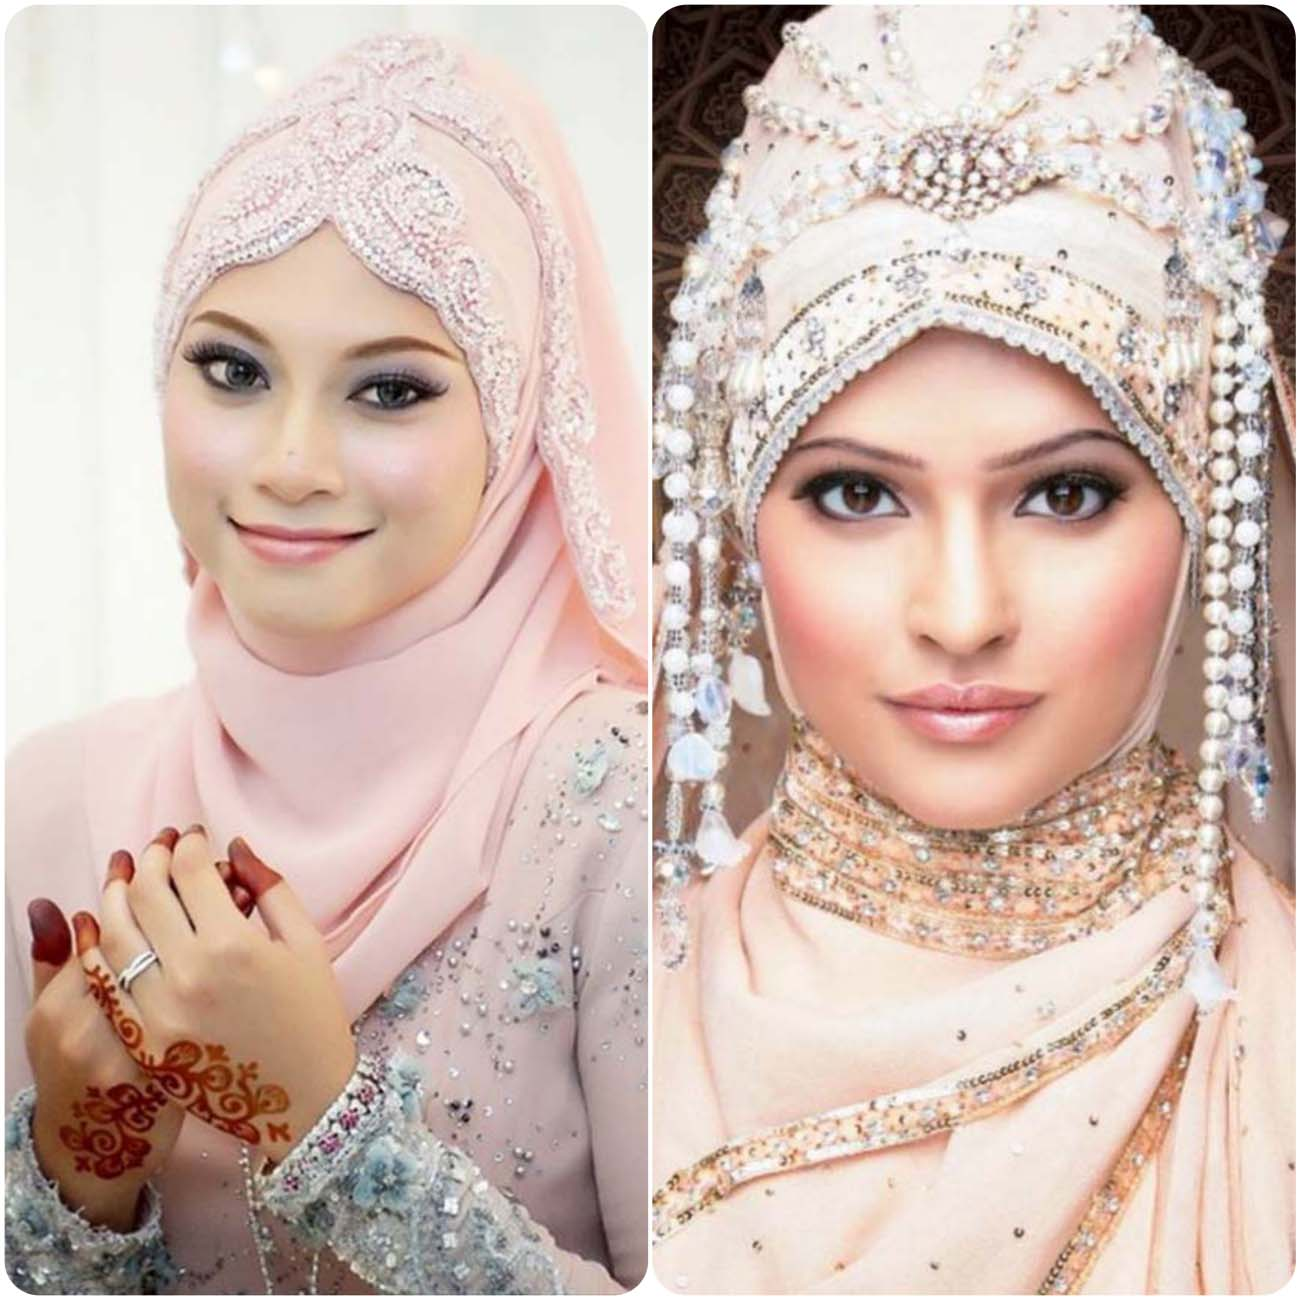 Designers Abaya Dresses Designs For Wedding Bridals 2016-2017...styloplanet (21)